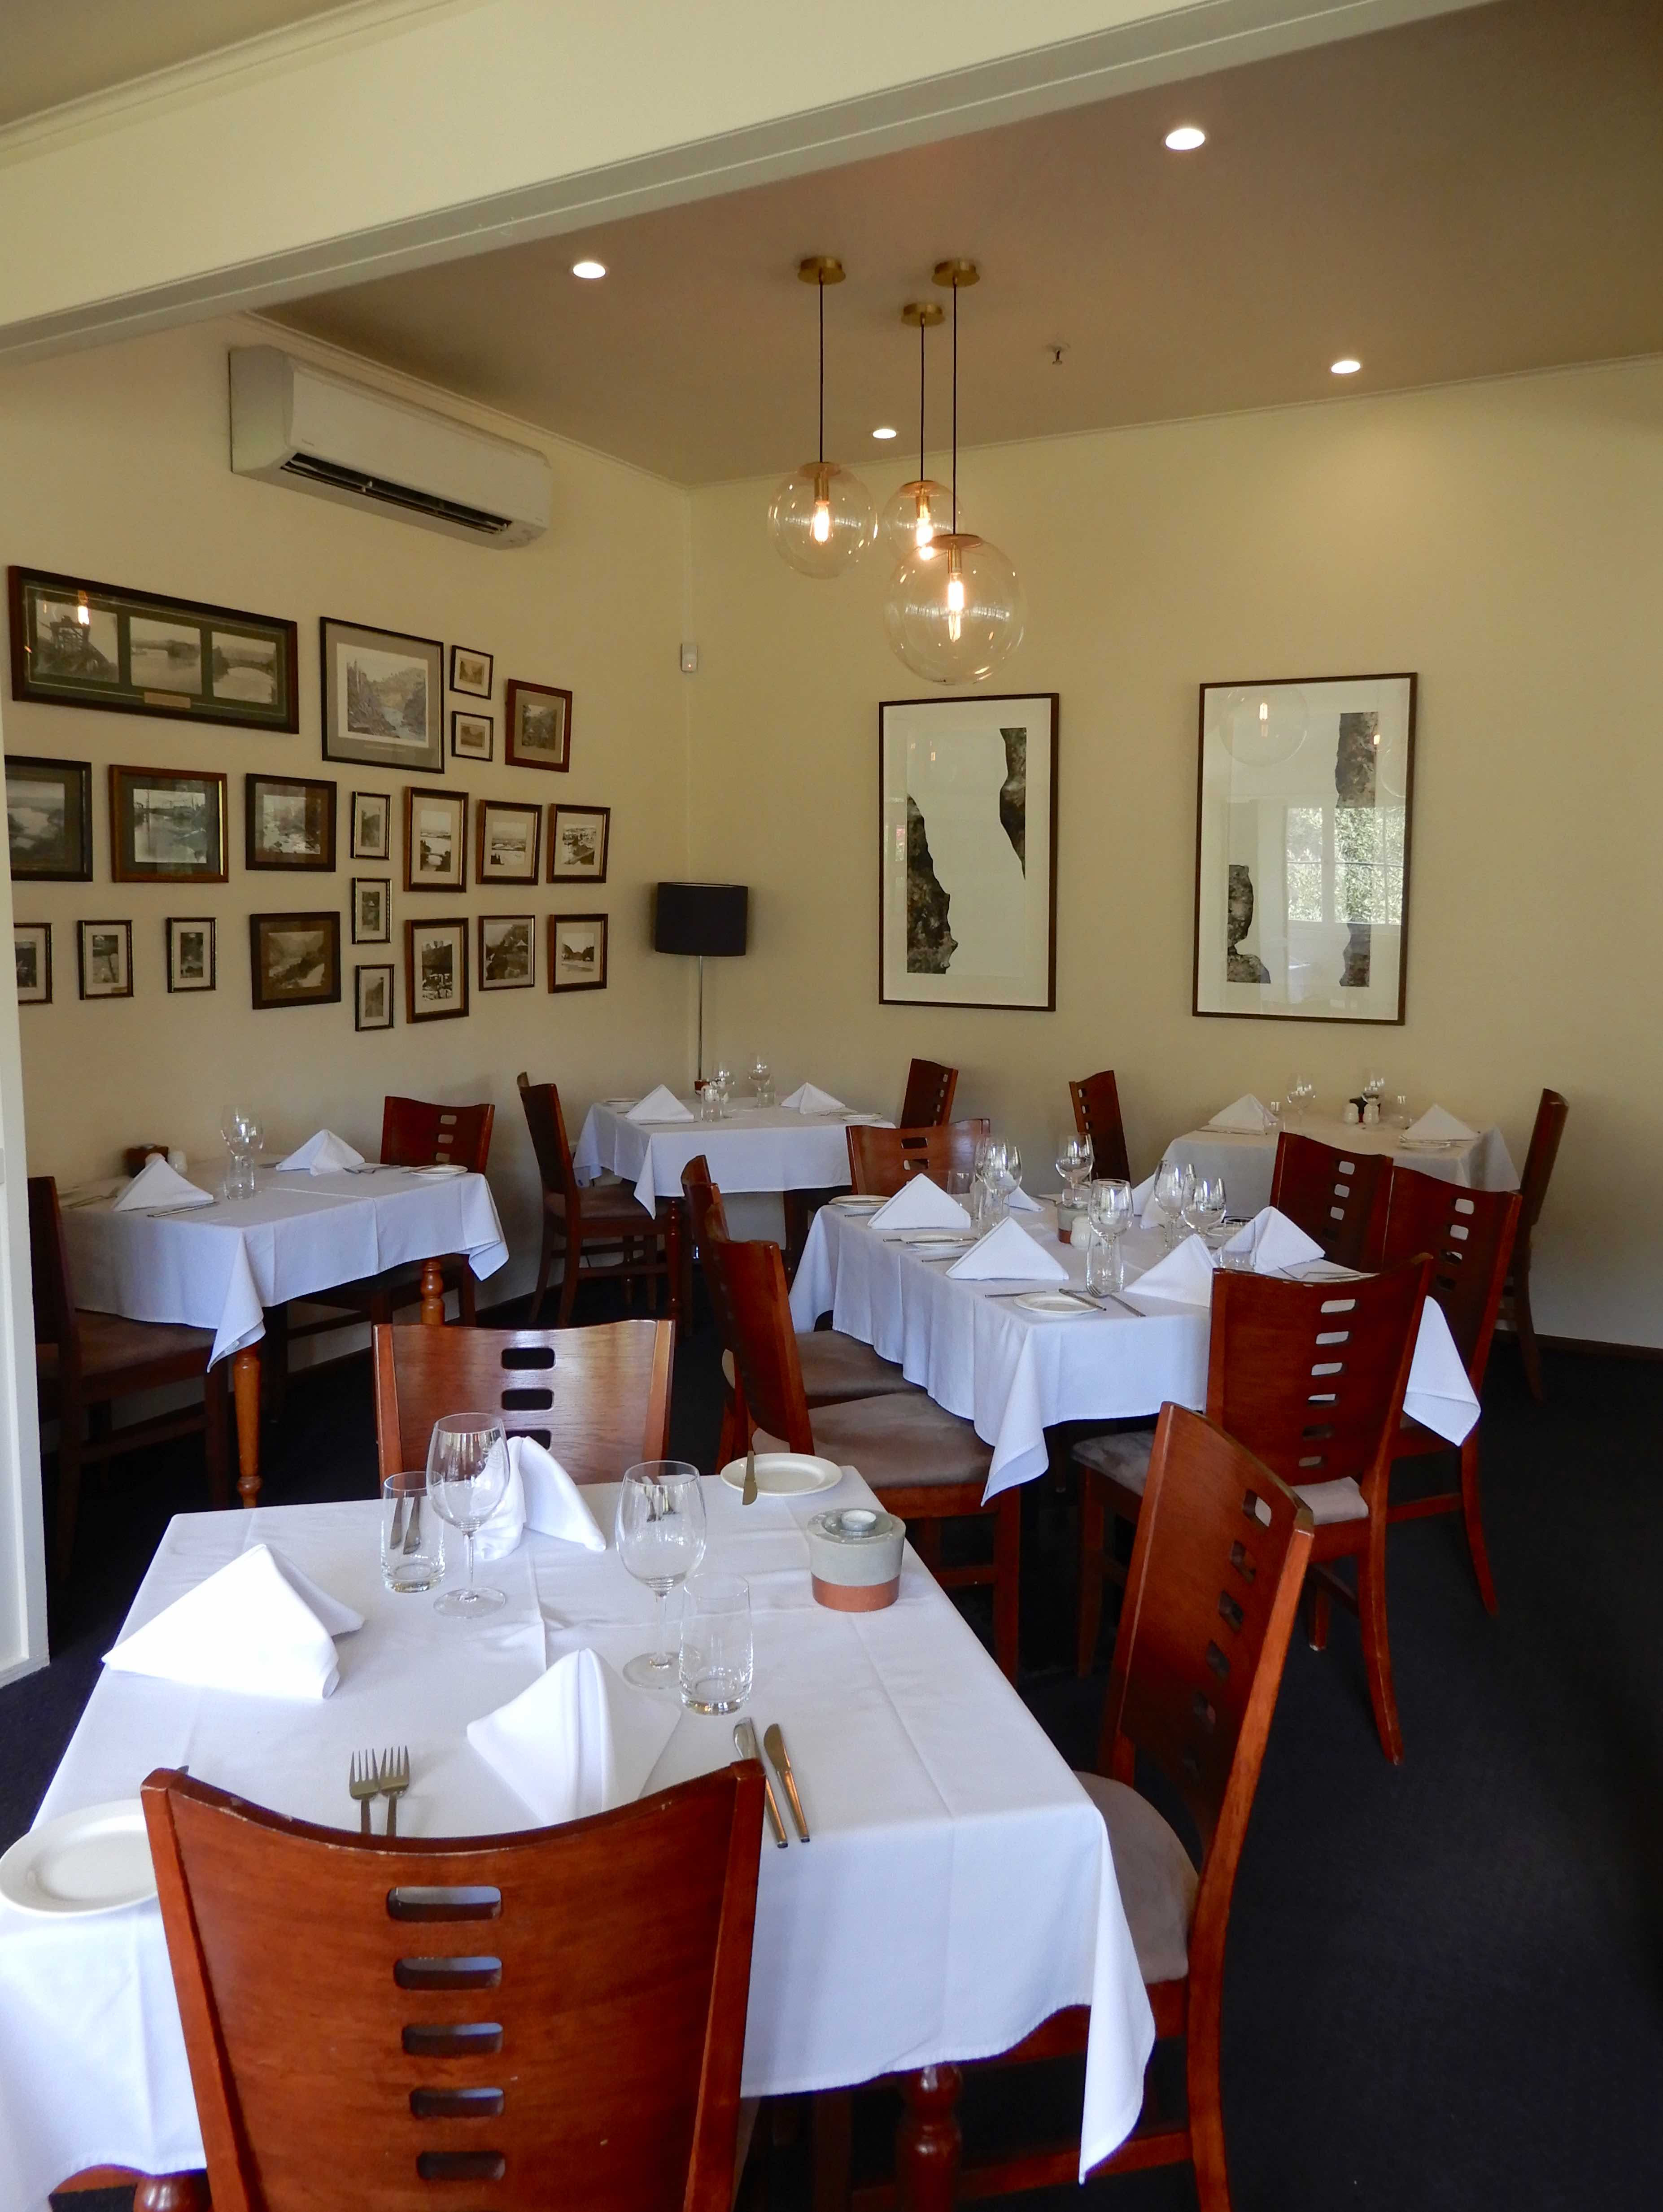 4.The Gorge Restaurant